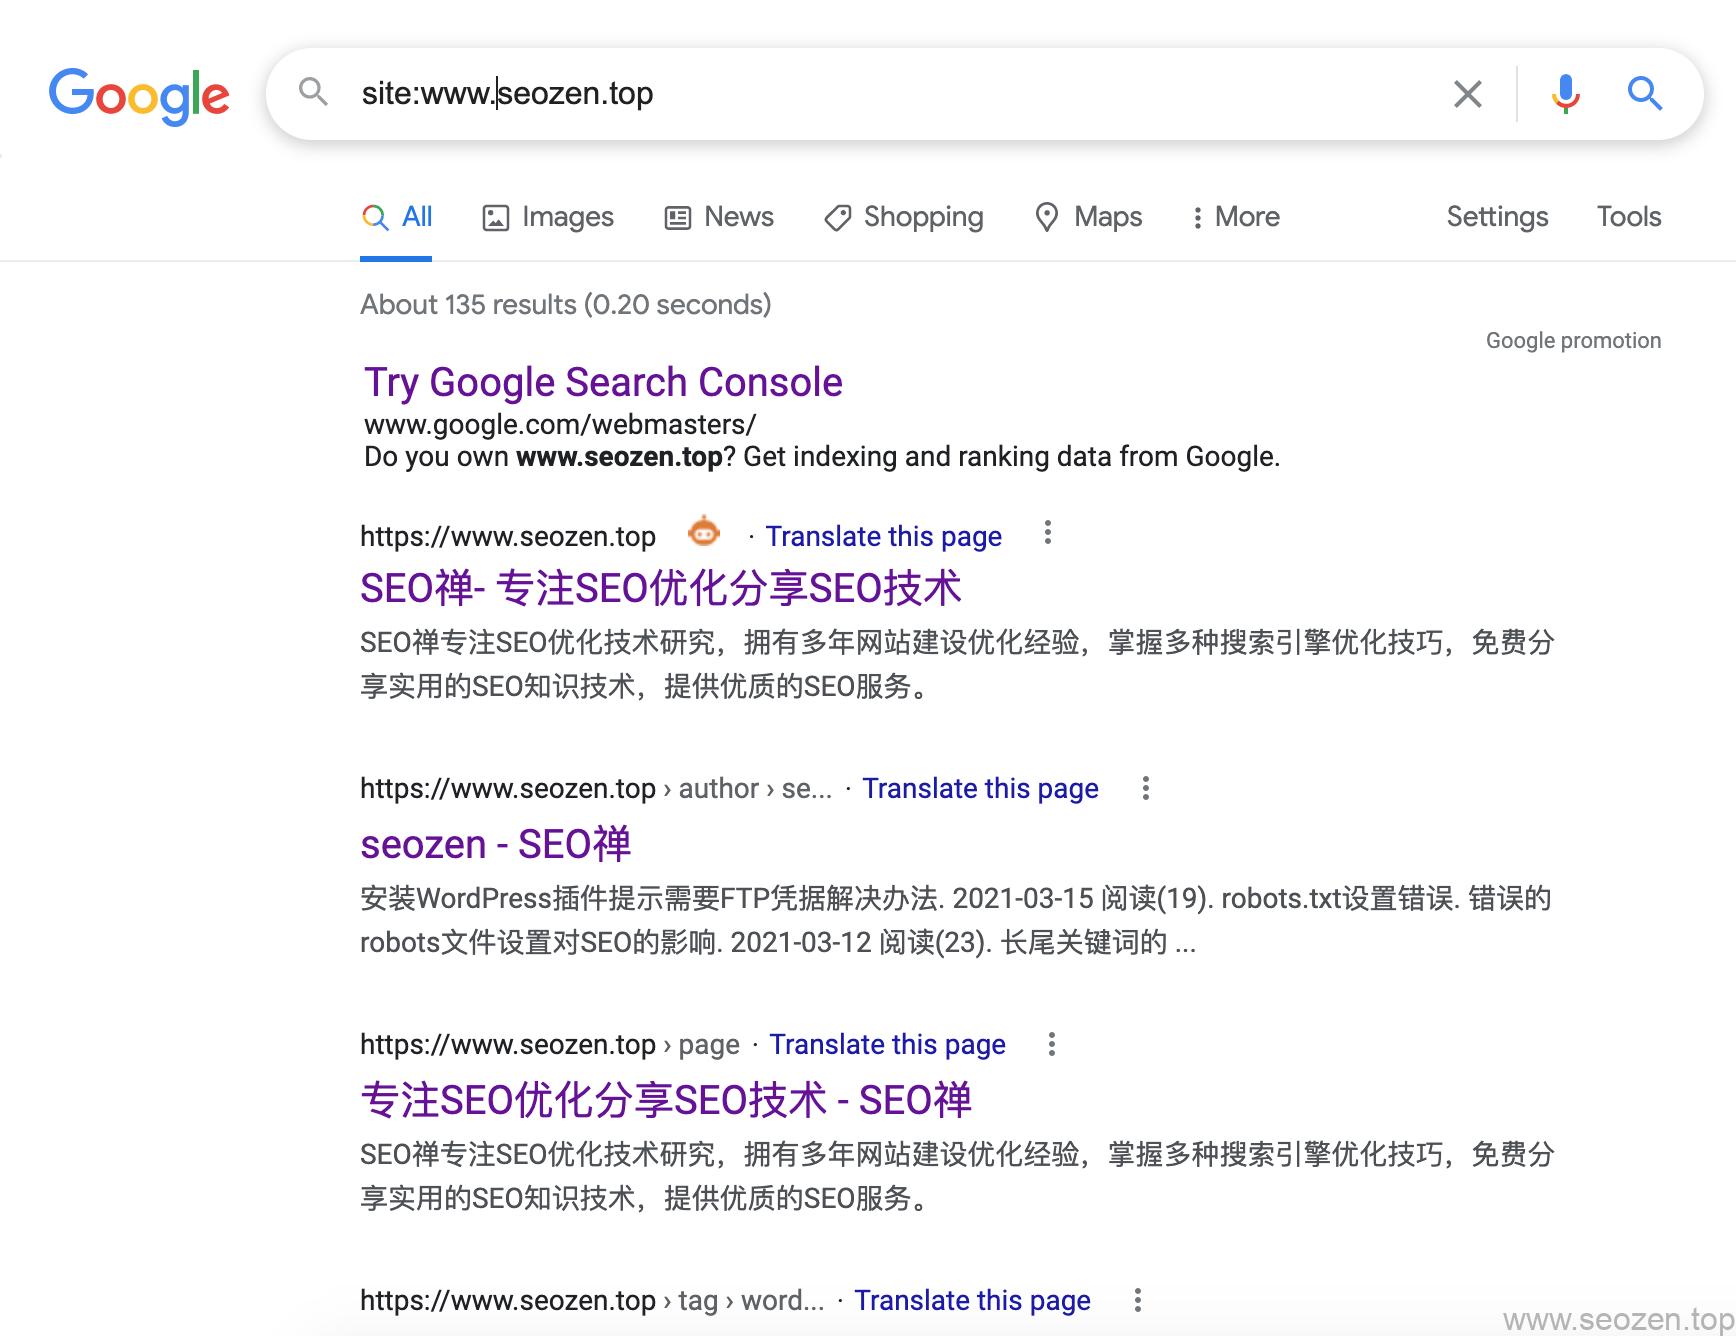 SEO禅谷歌site结果